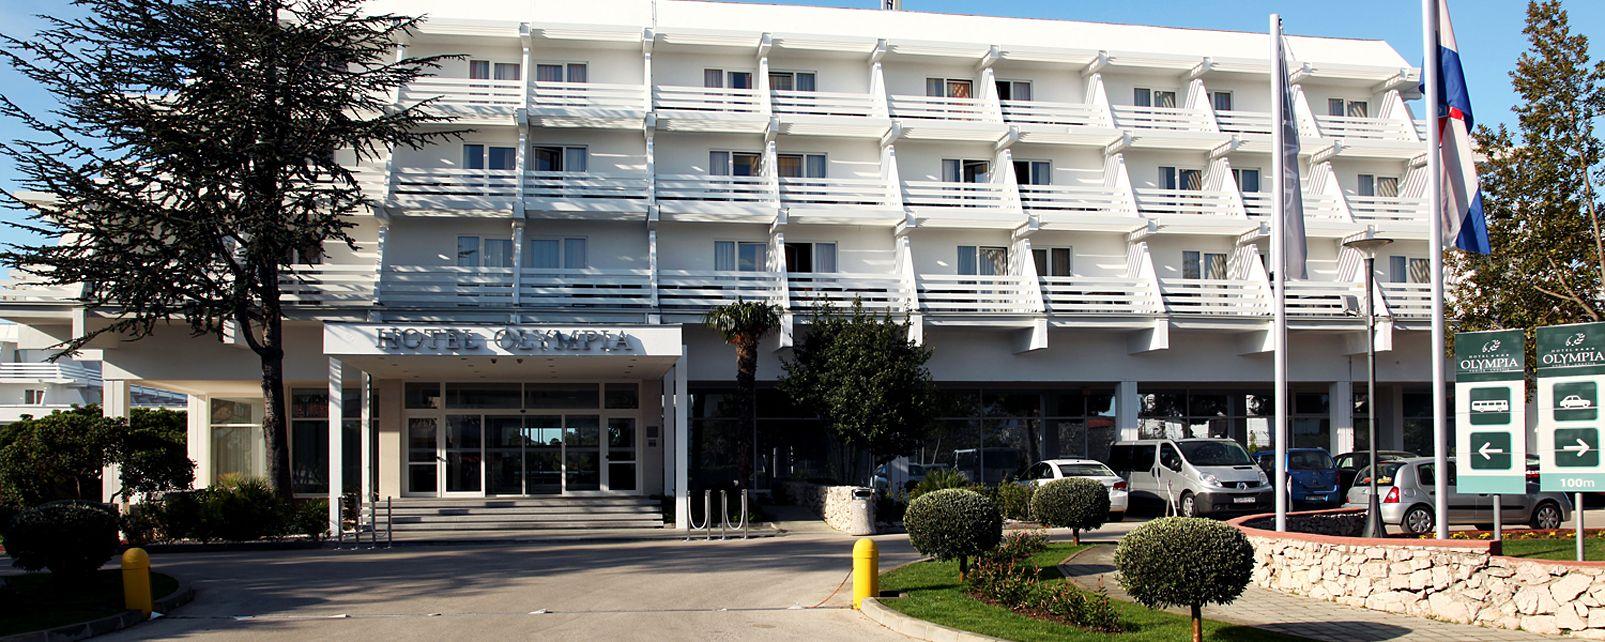 Hotel olympia vodice for Piscina hotel olympia